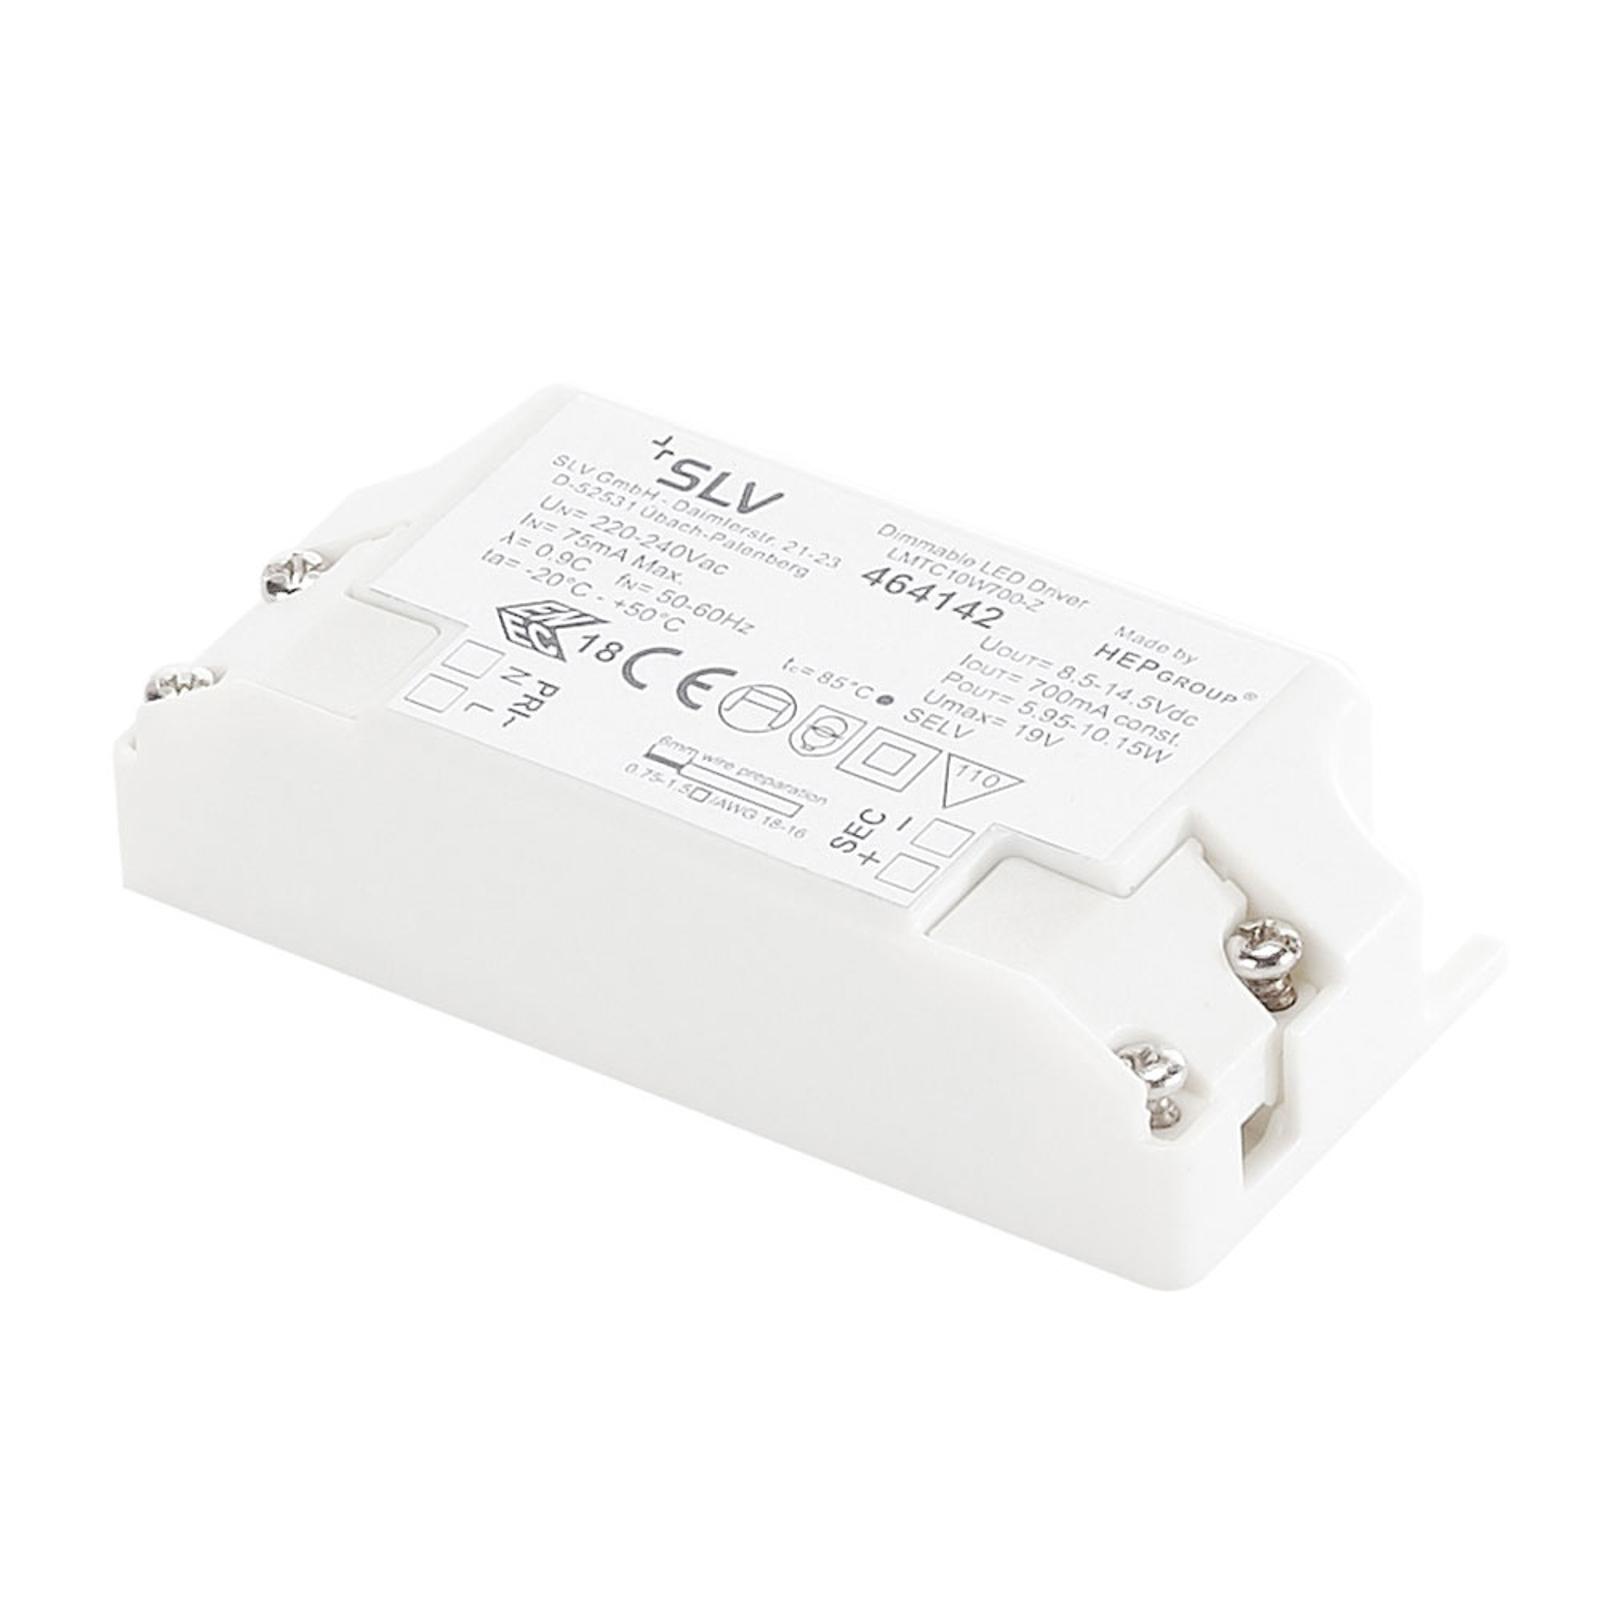 SLV LED-Treiber 10,5W 700mA, dimmbar